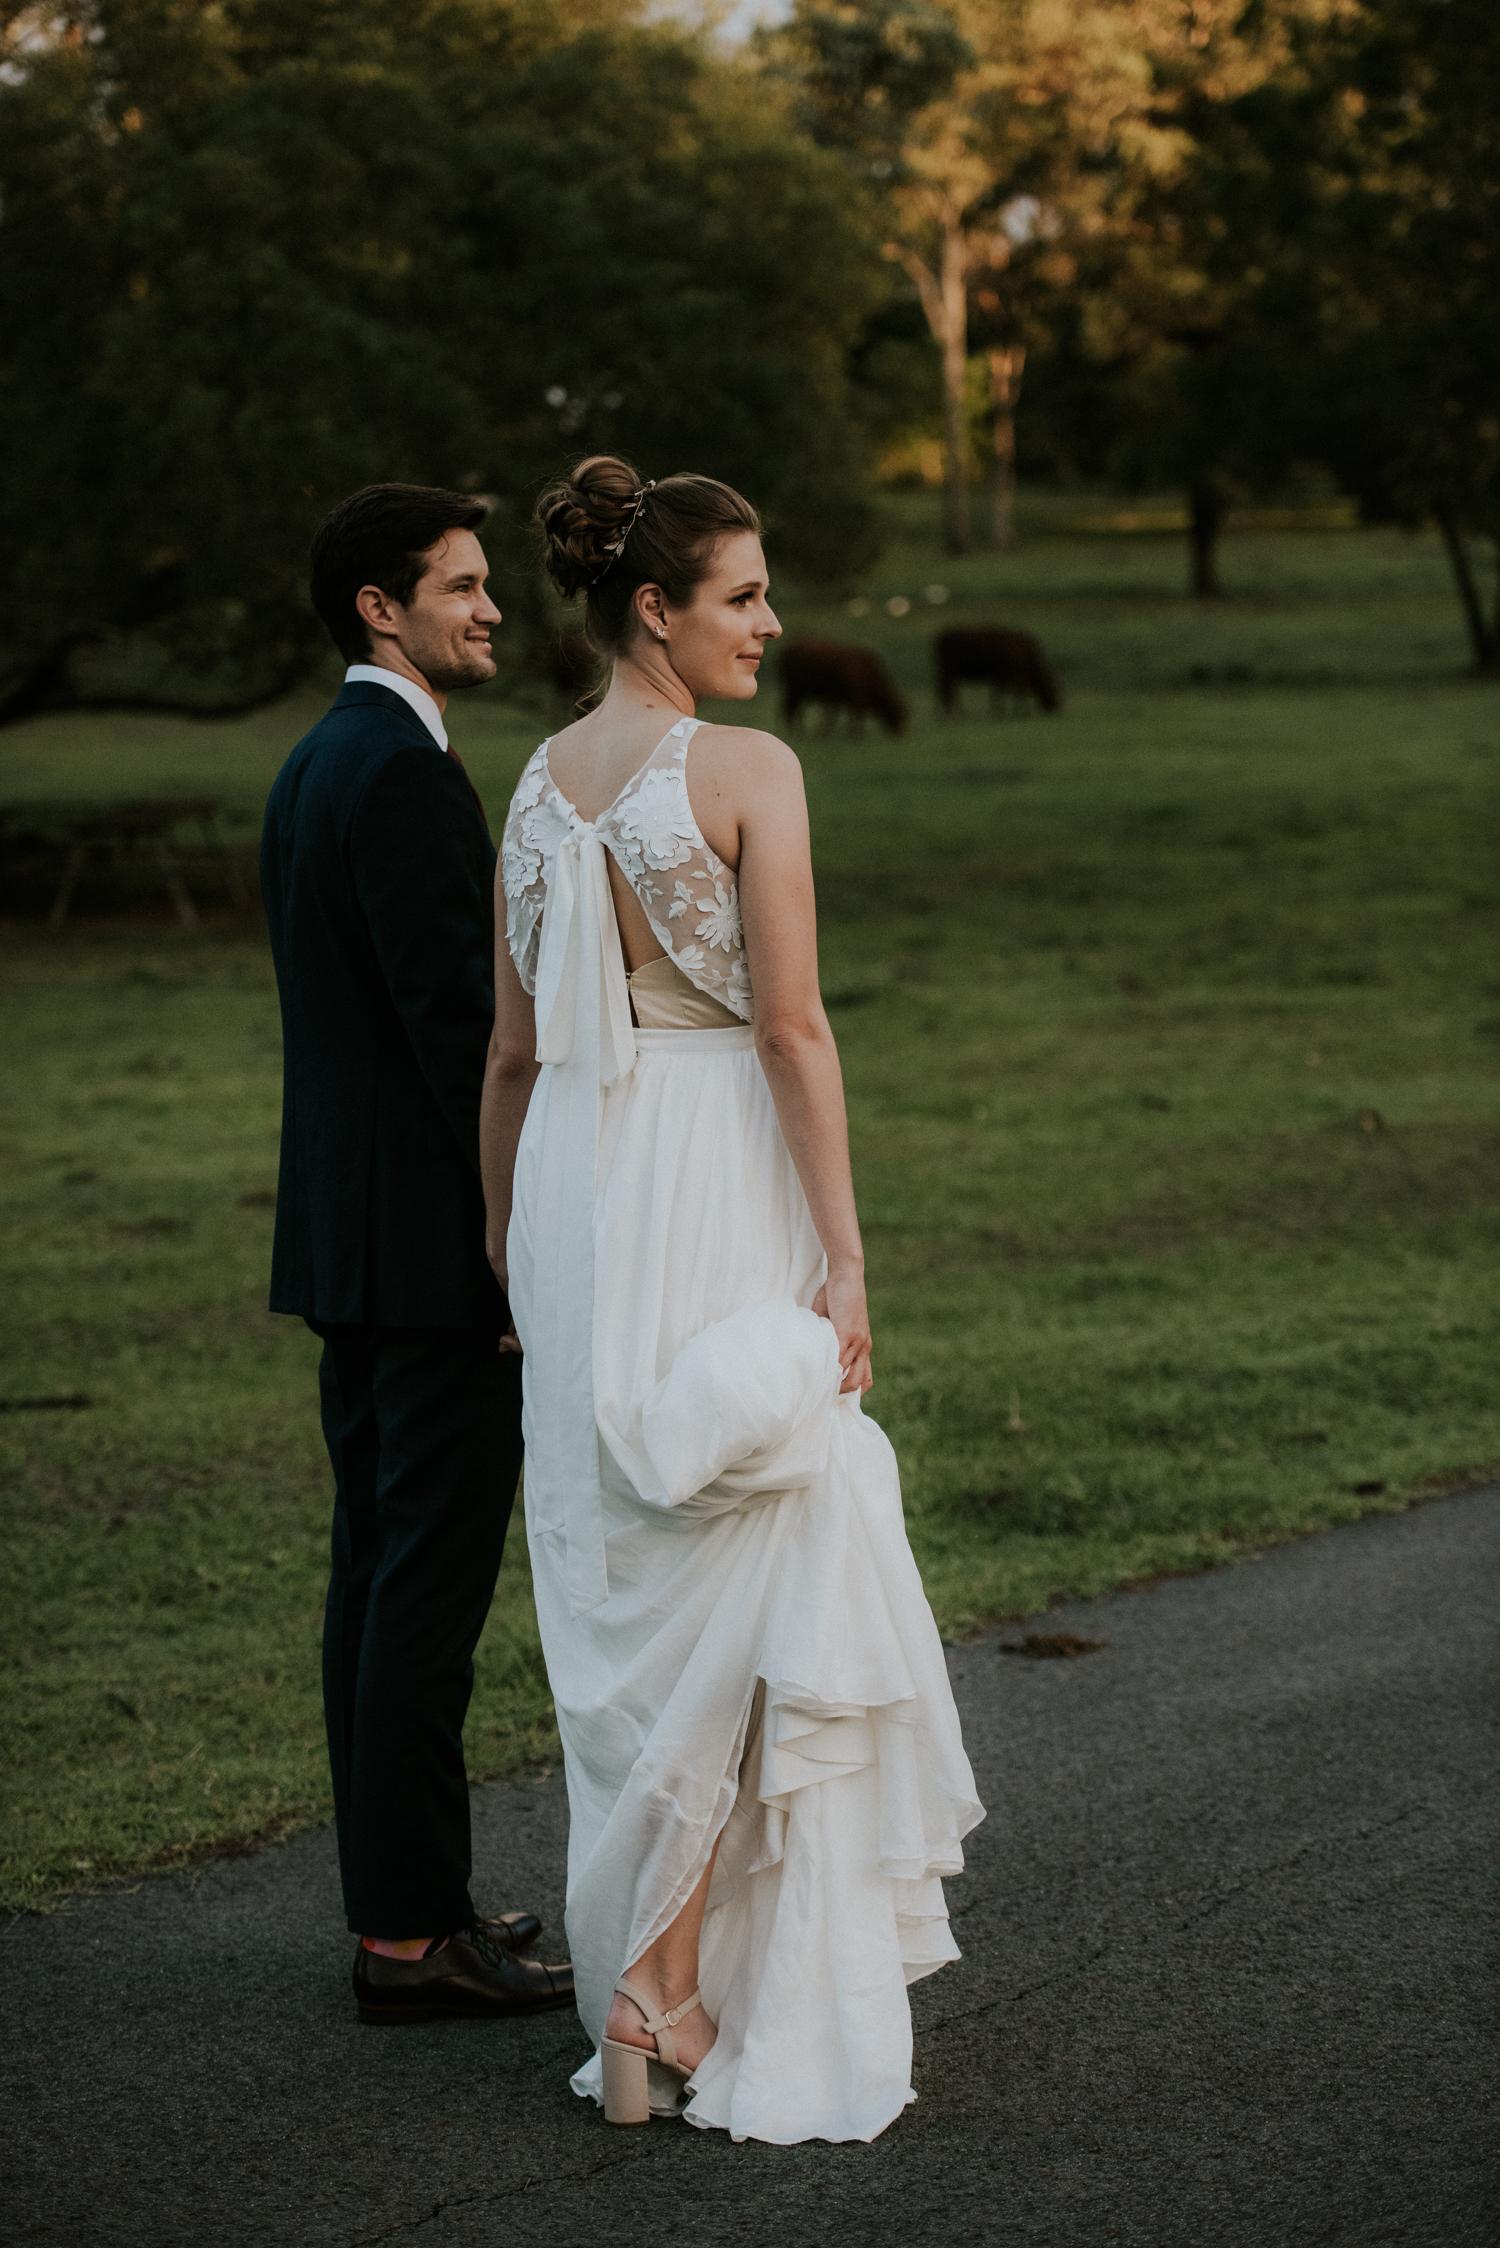 Brisbane Wedding Photographer | Bundaleer Rainforest Gardens Elopement Photography-81.jpg